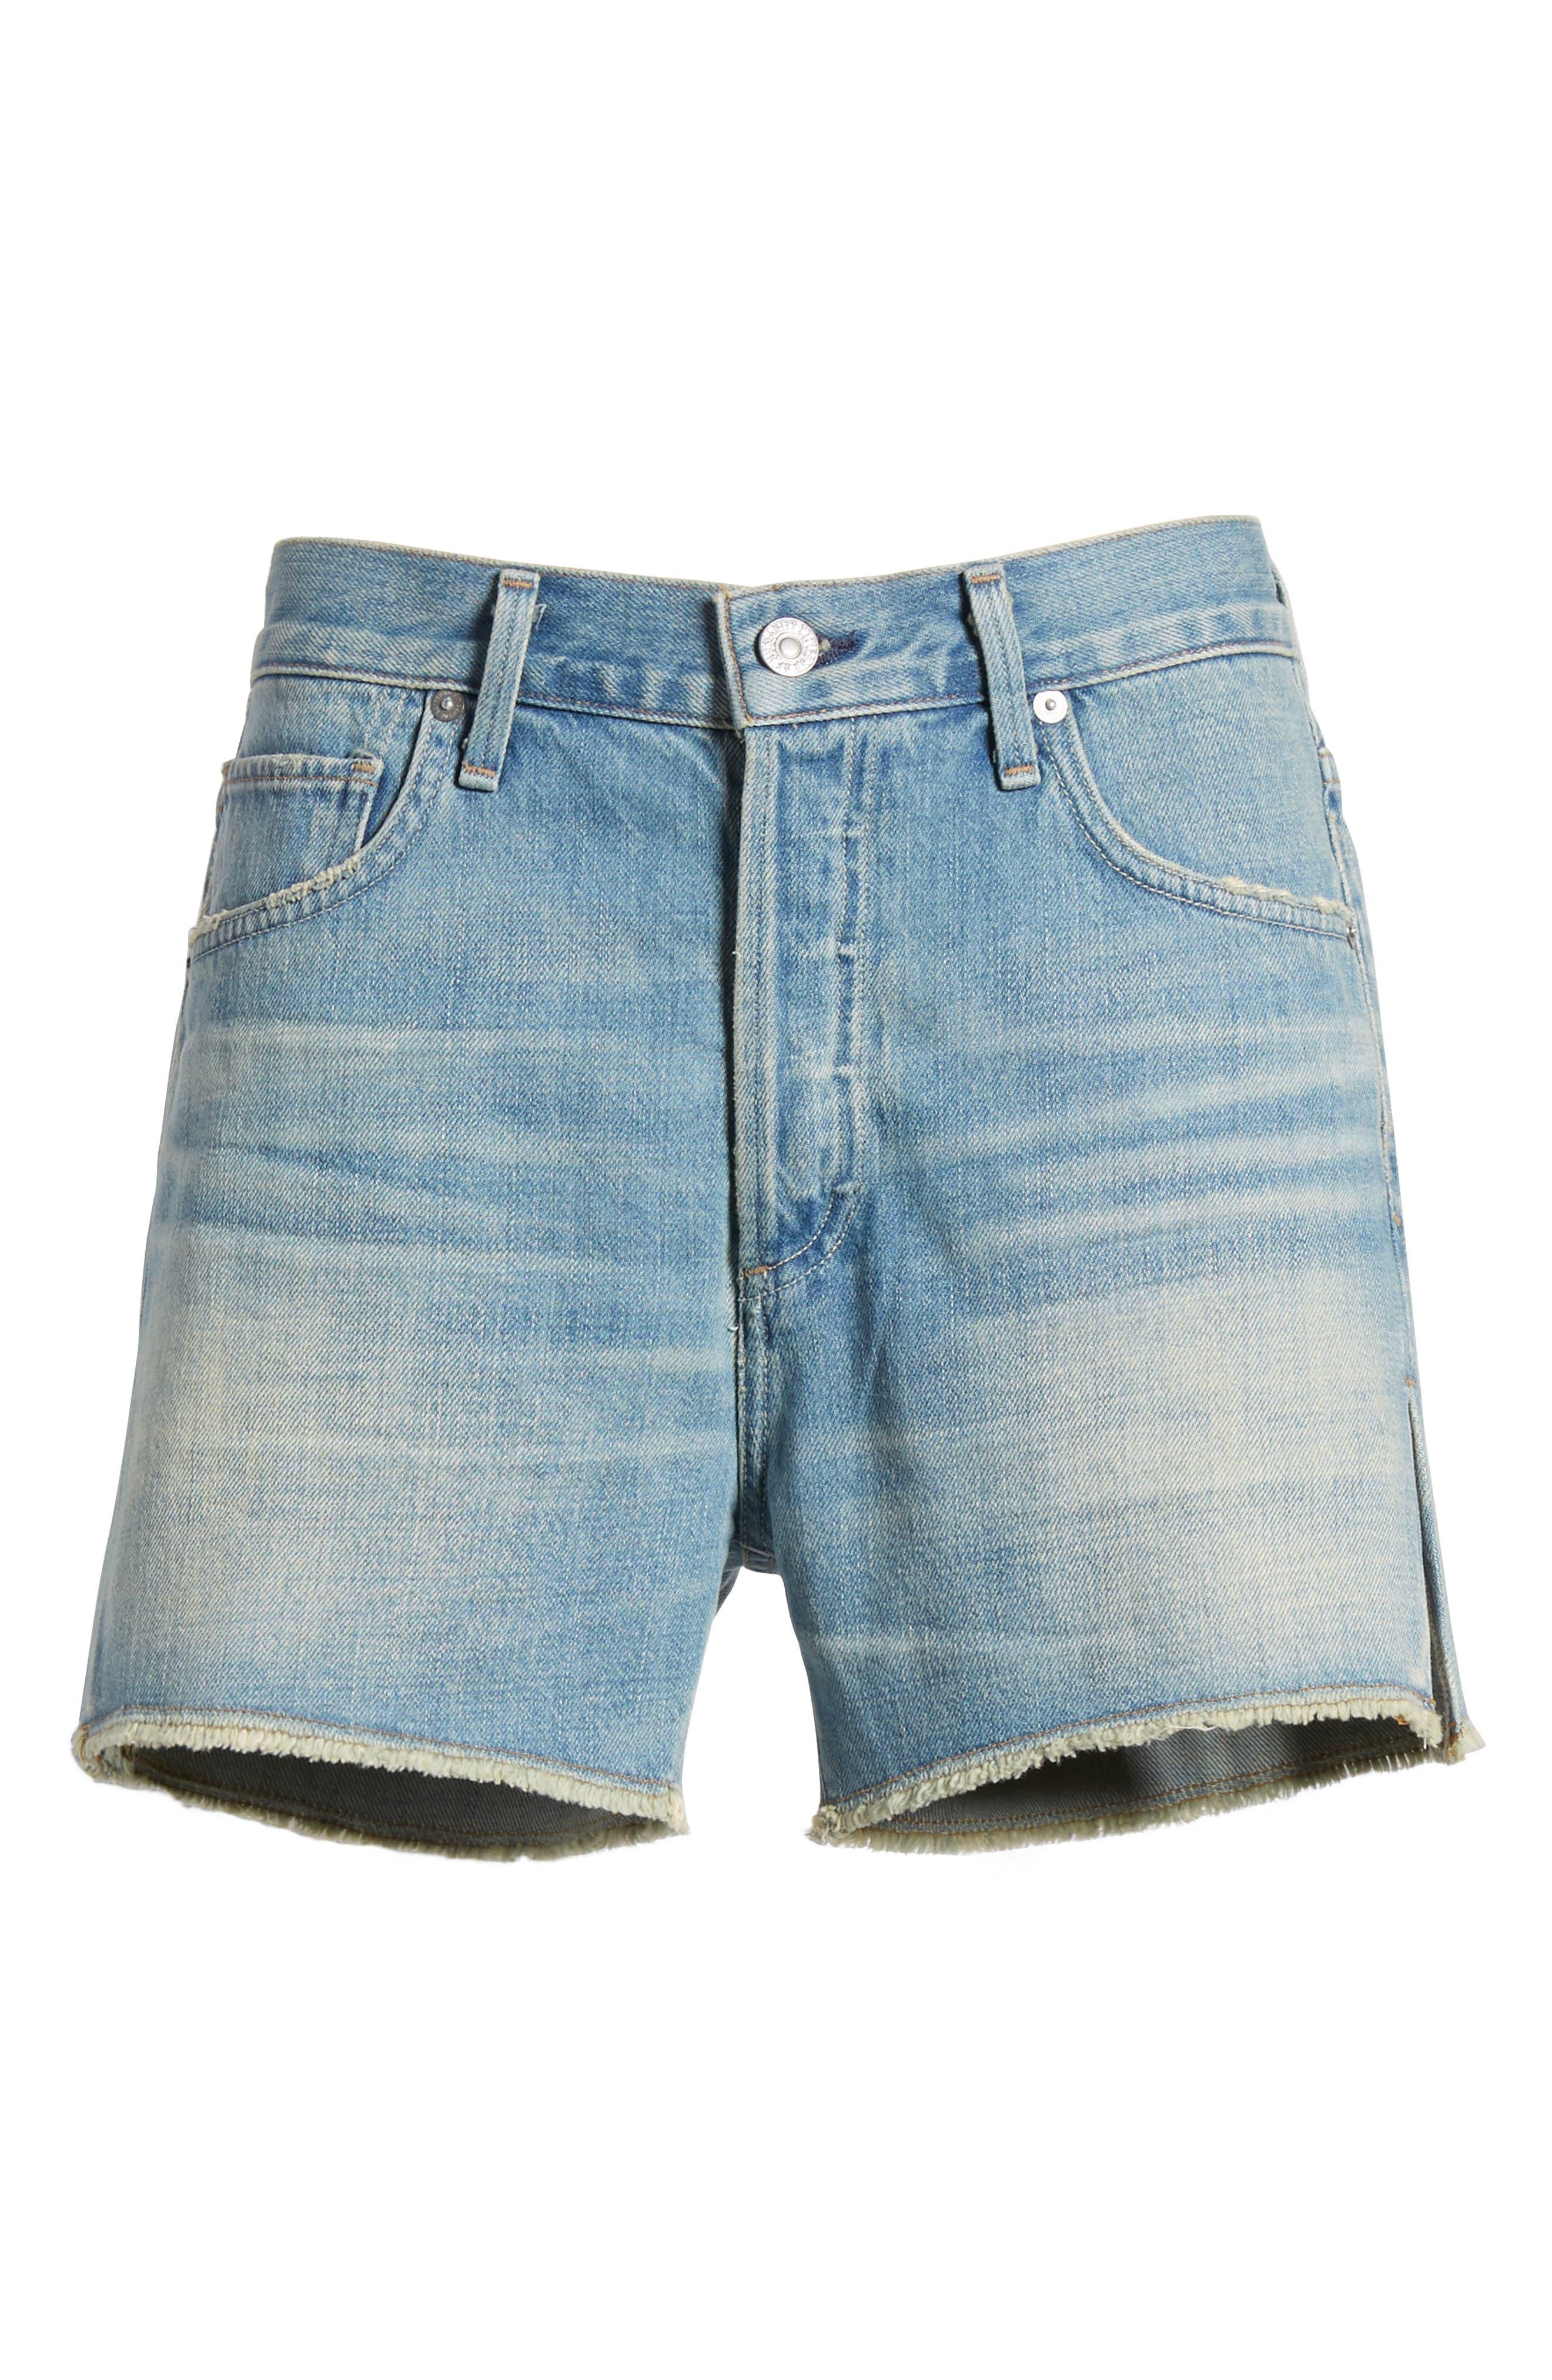 Corey Distressed Slouchy Denim Shorts,                             Alternate thumbnail 7, color,                             460